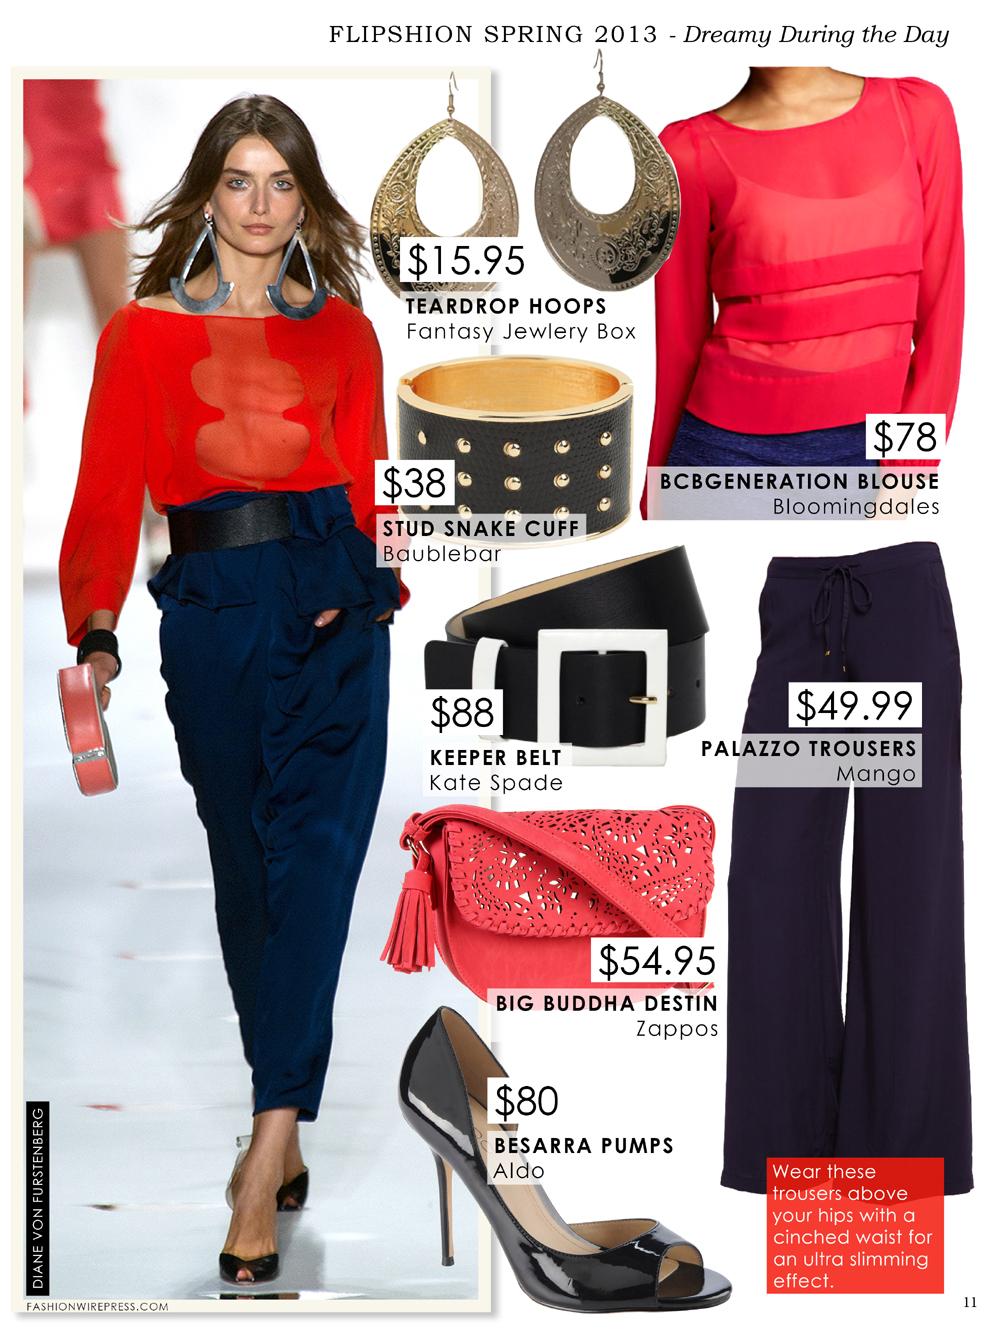 Best Fashion App Iphone Ipad Budget Shopping Closet Instant Flipshion  Catwalk Designer Looks Gucci Chanel Louis Vuitton Dvf 3 Apple, Itunes,  Newsstand